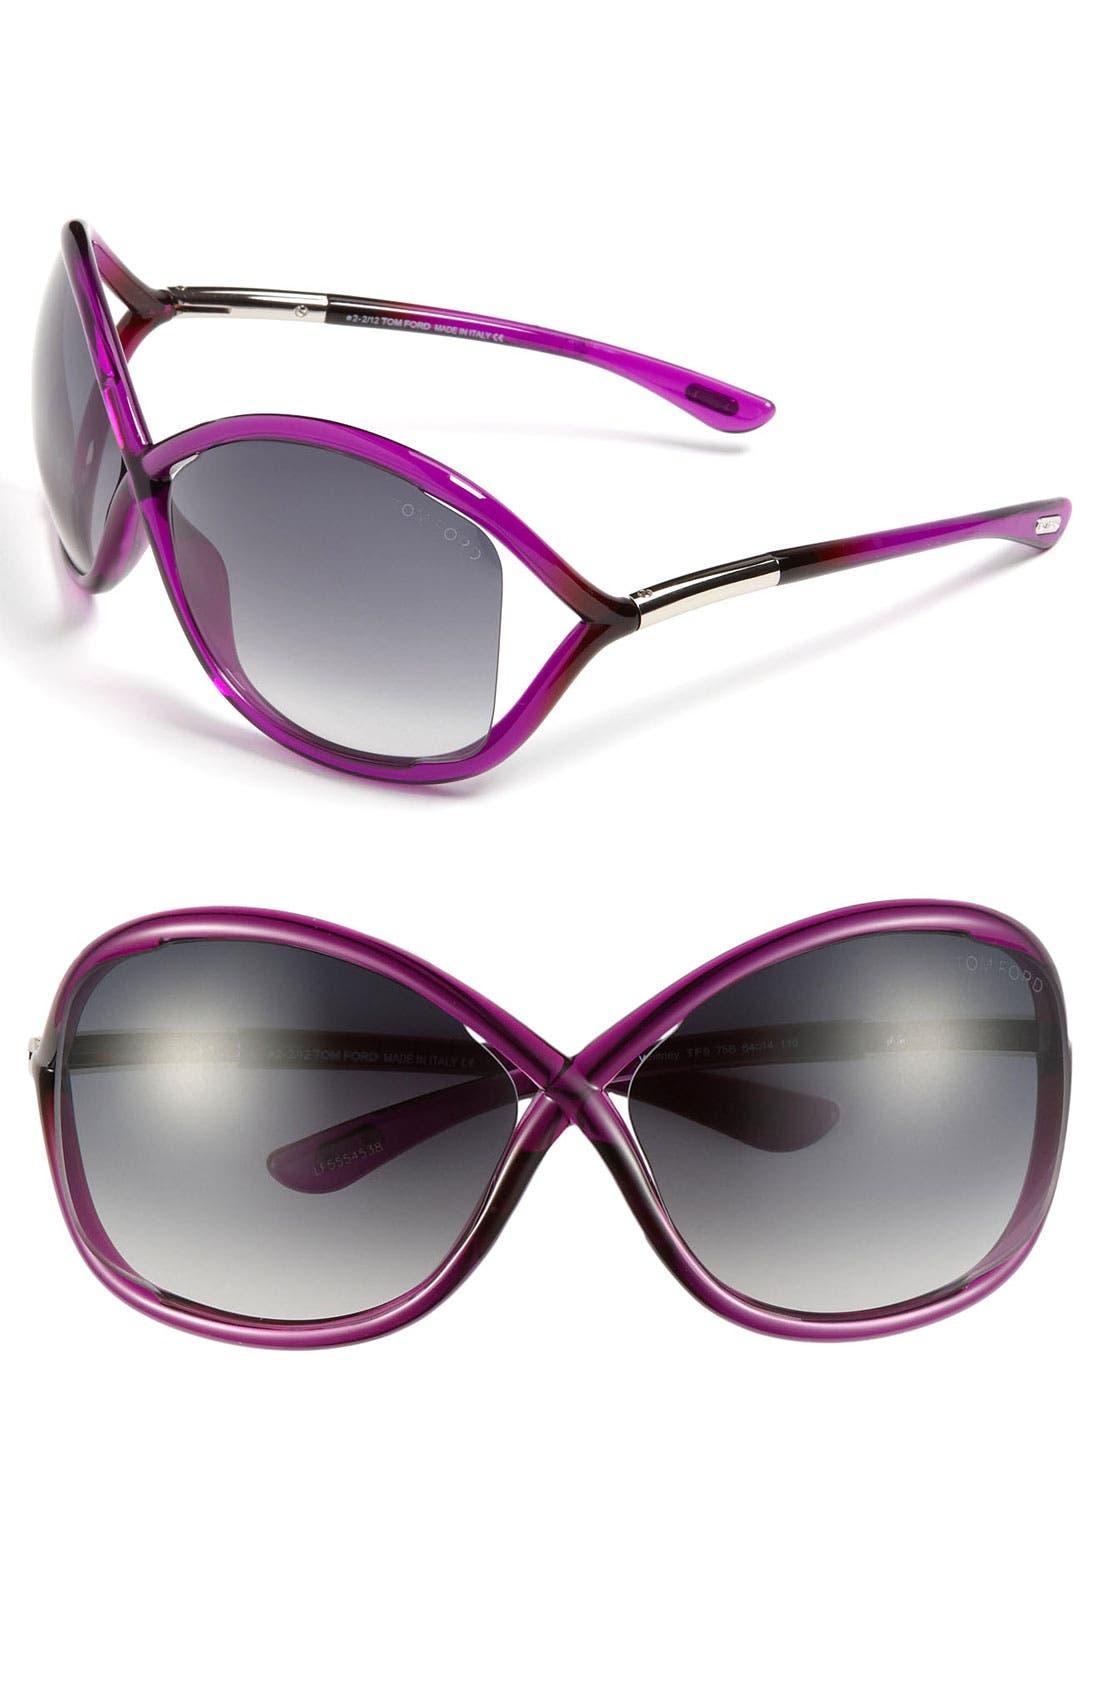 Main Image - Tom Ford 'Whitney' 64mm Sunglasses